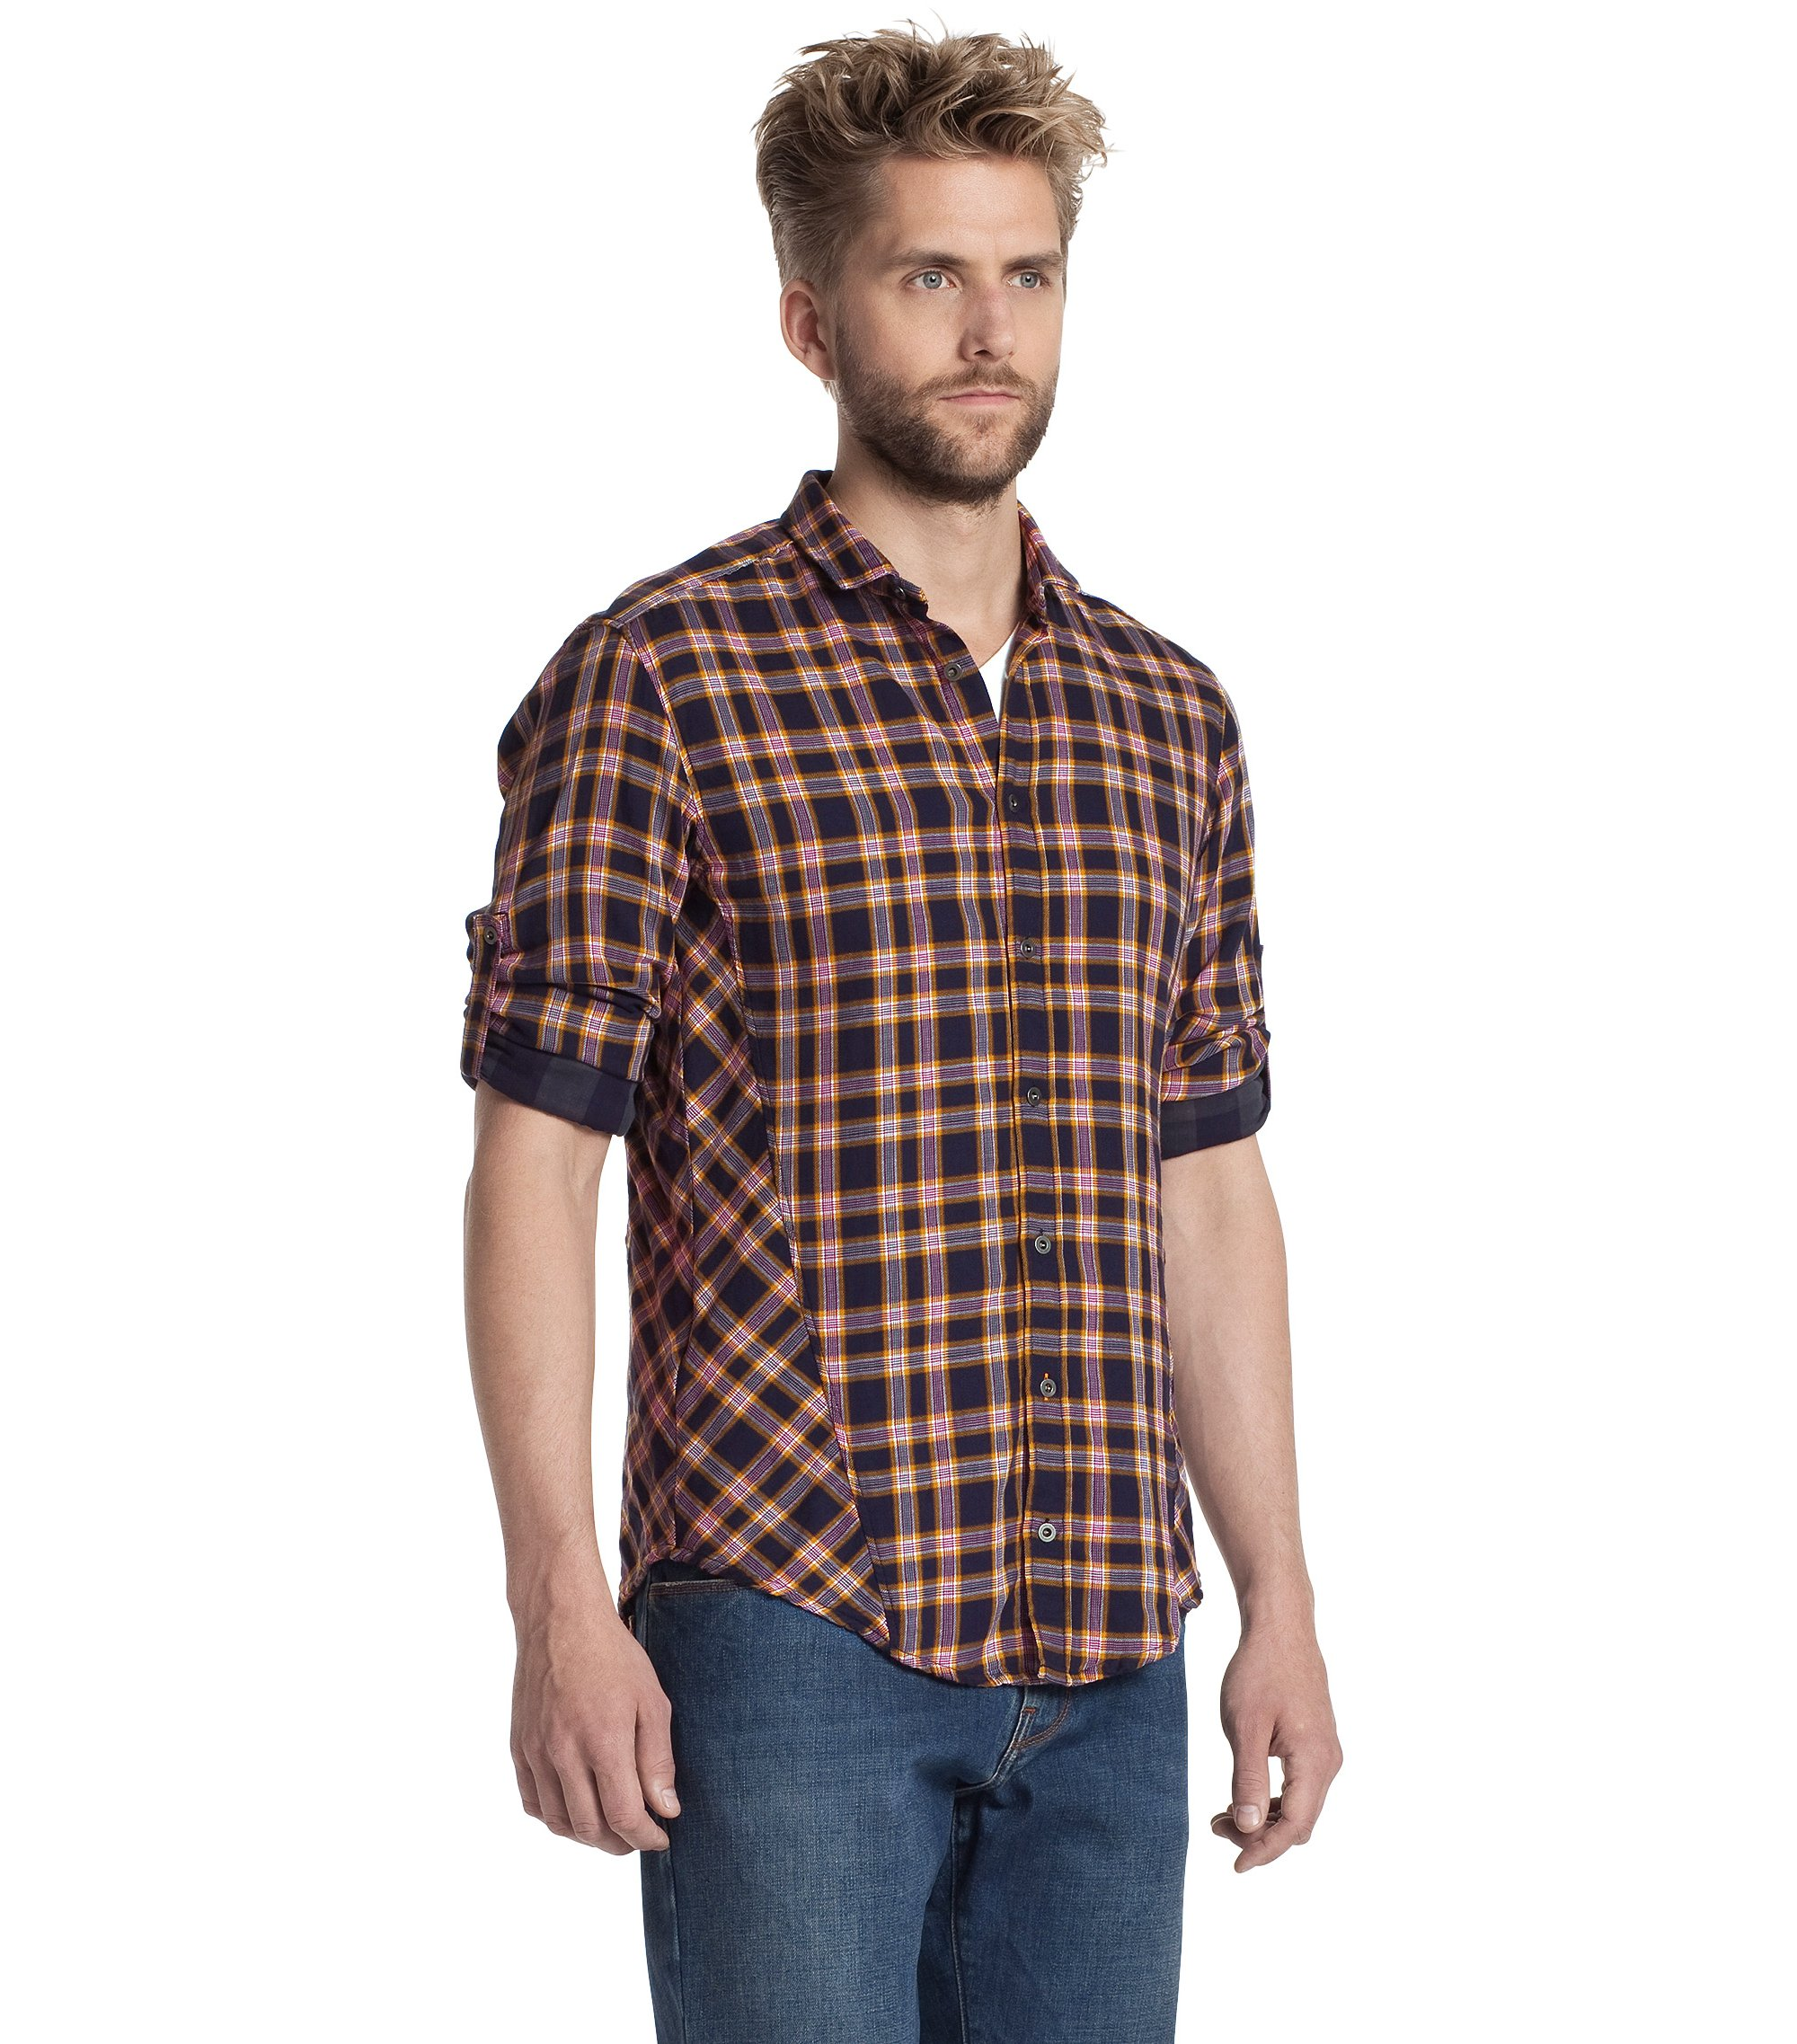 Leisure shirt with a mini Kent collar 'CaE', Open Orange